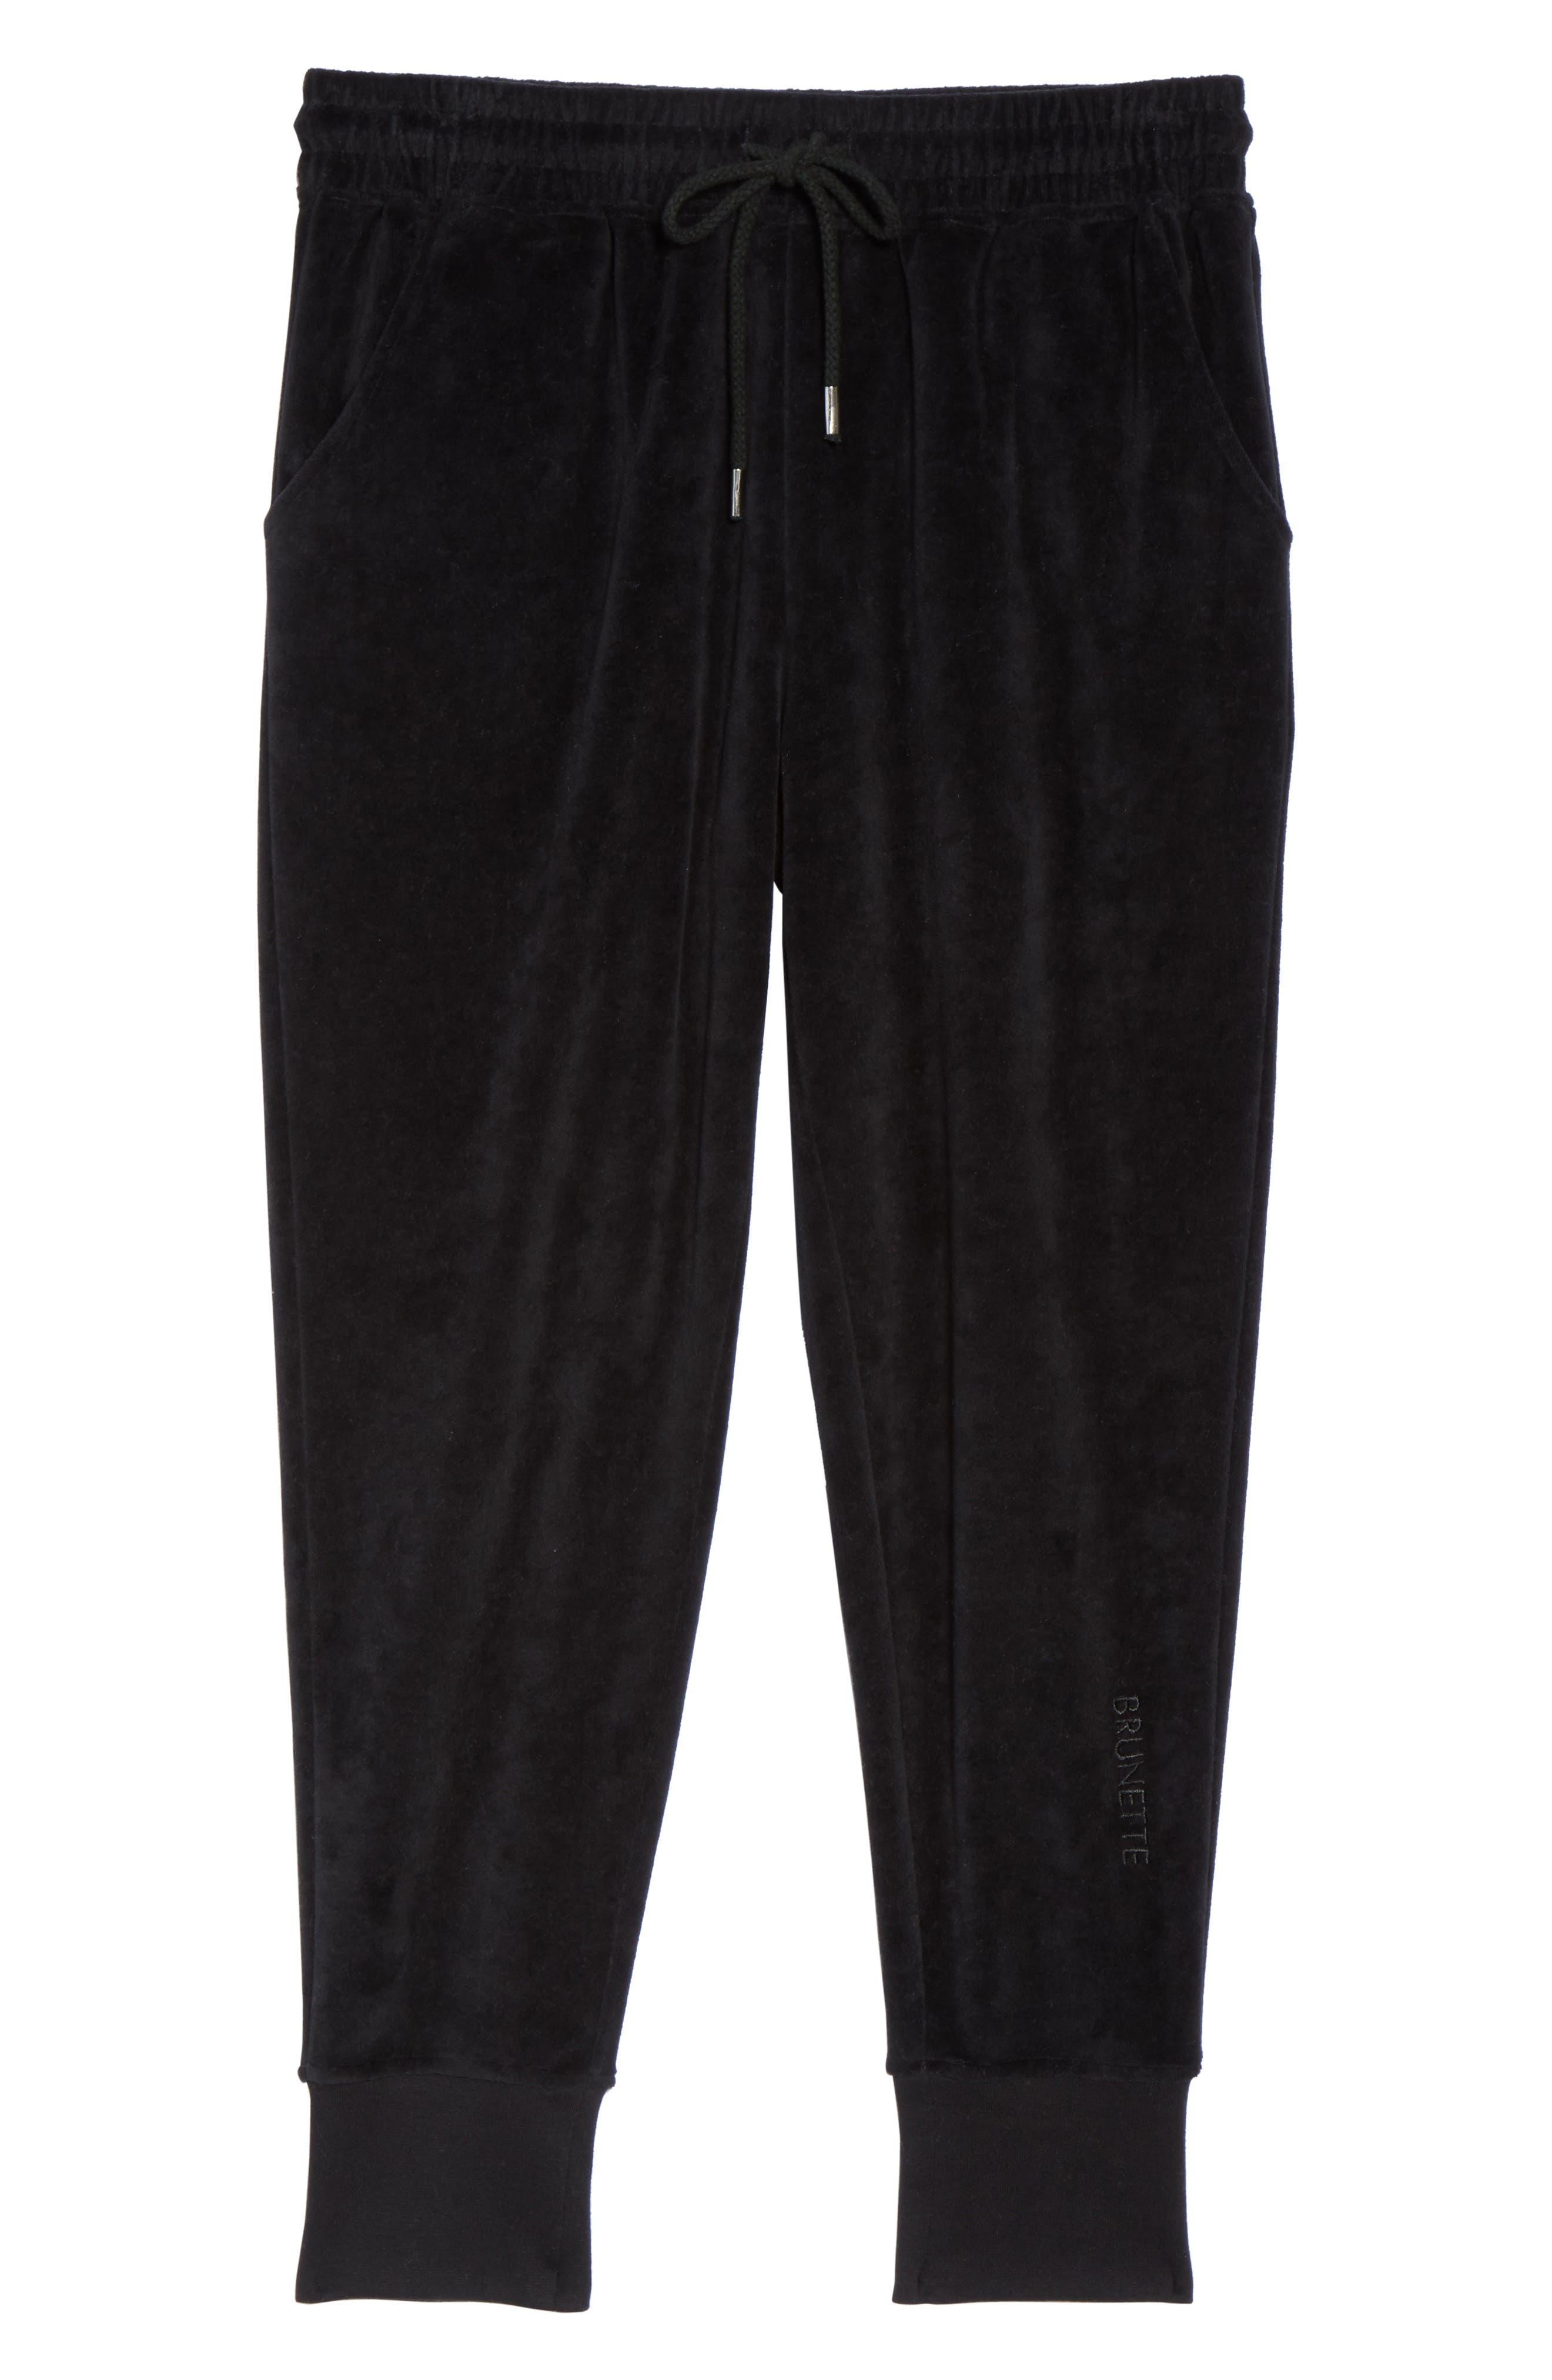 Brunette Embroidered Velour Jogger Pants,                             Alternate thumbnail 6, color,                             001